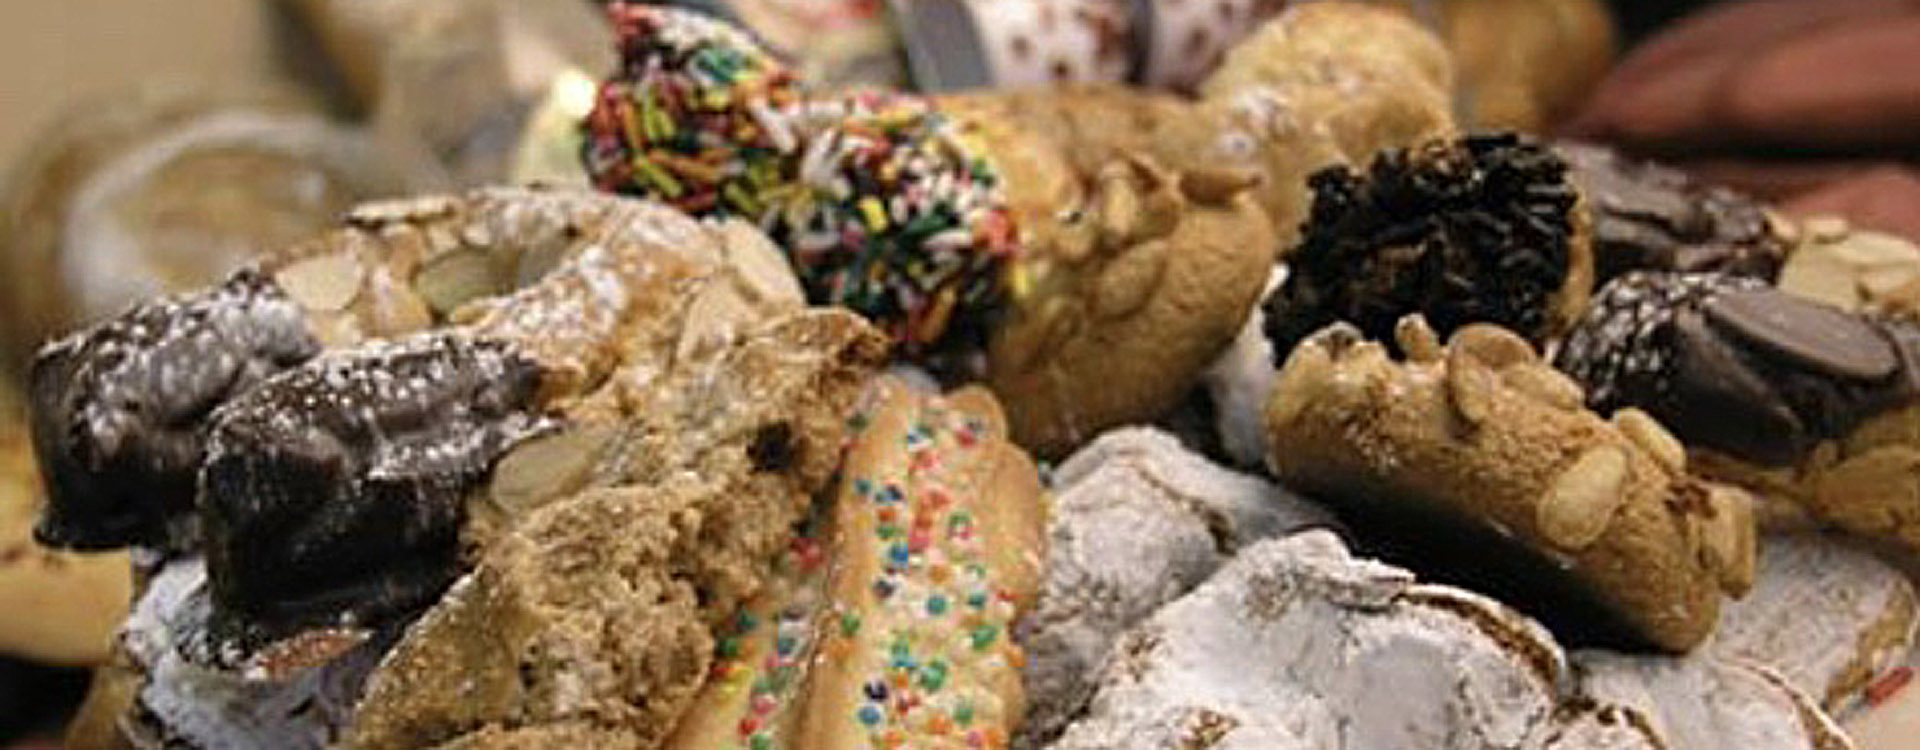 Italian Bakery | Baked Goods Boynton Beach | Palermo's